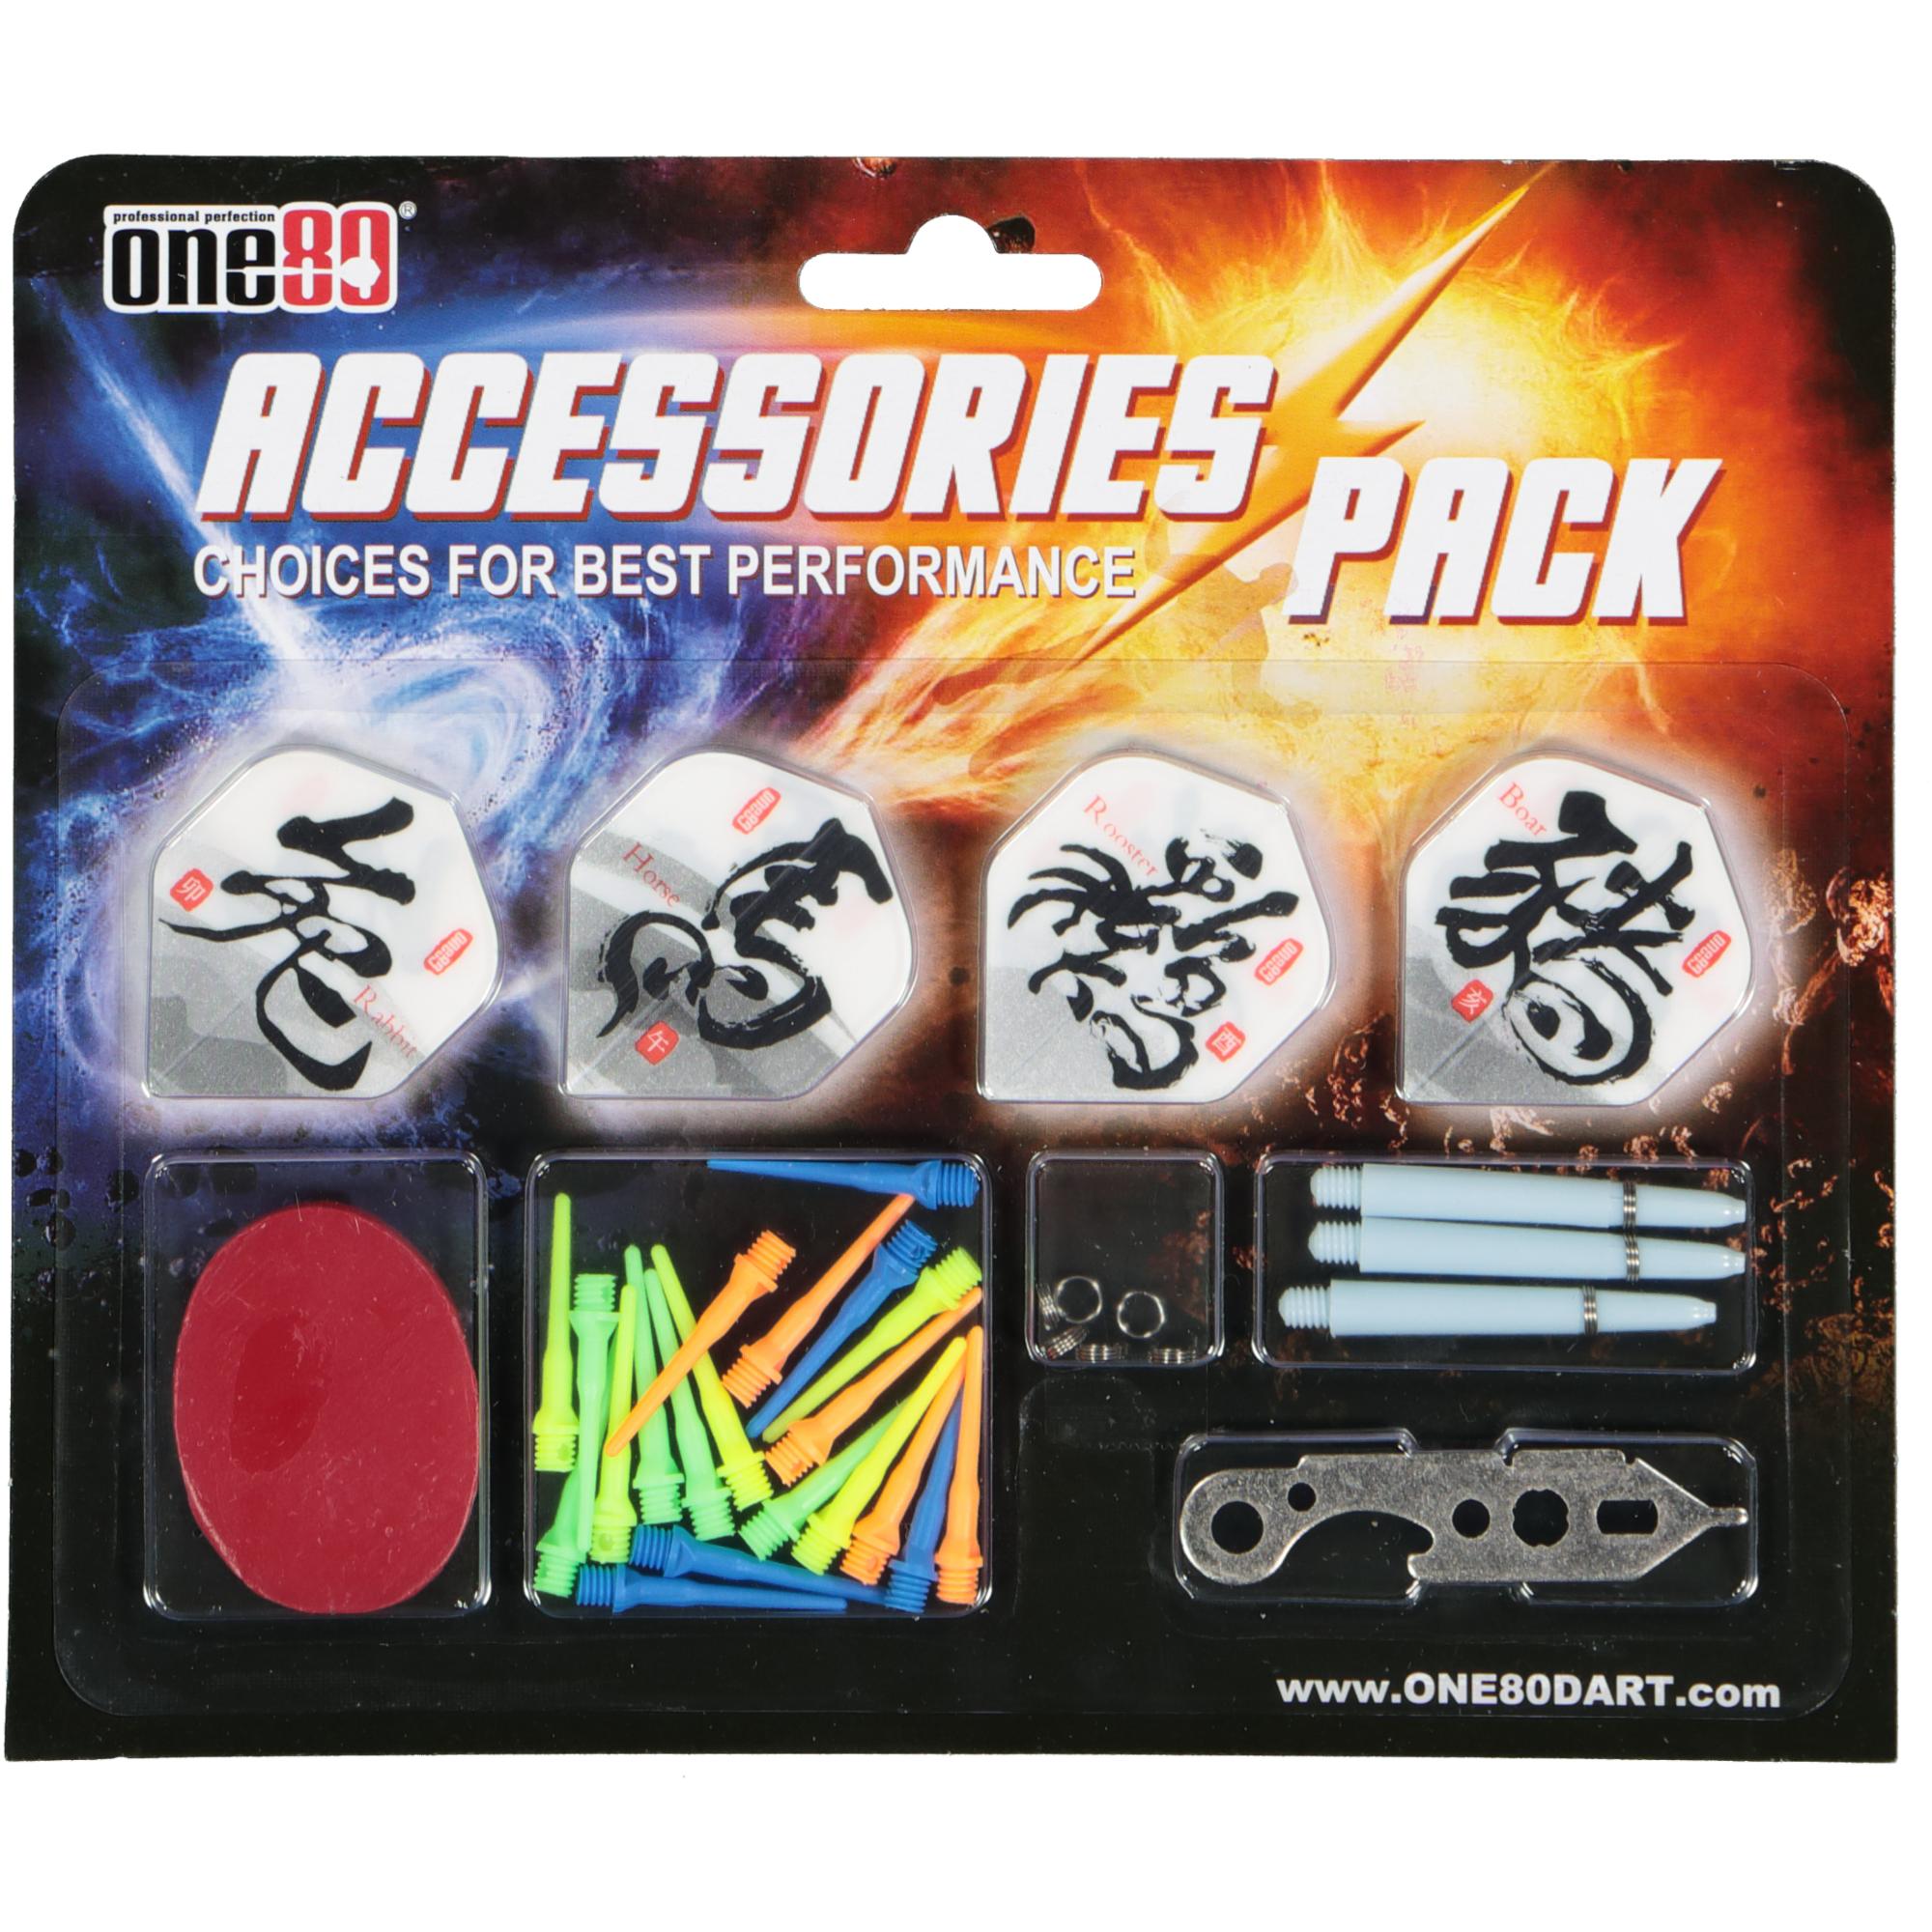 One80 Accessories Pack B, dart